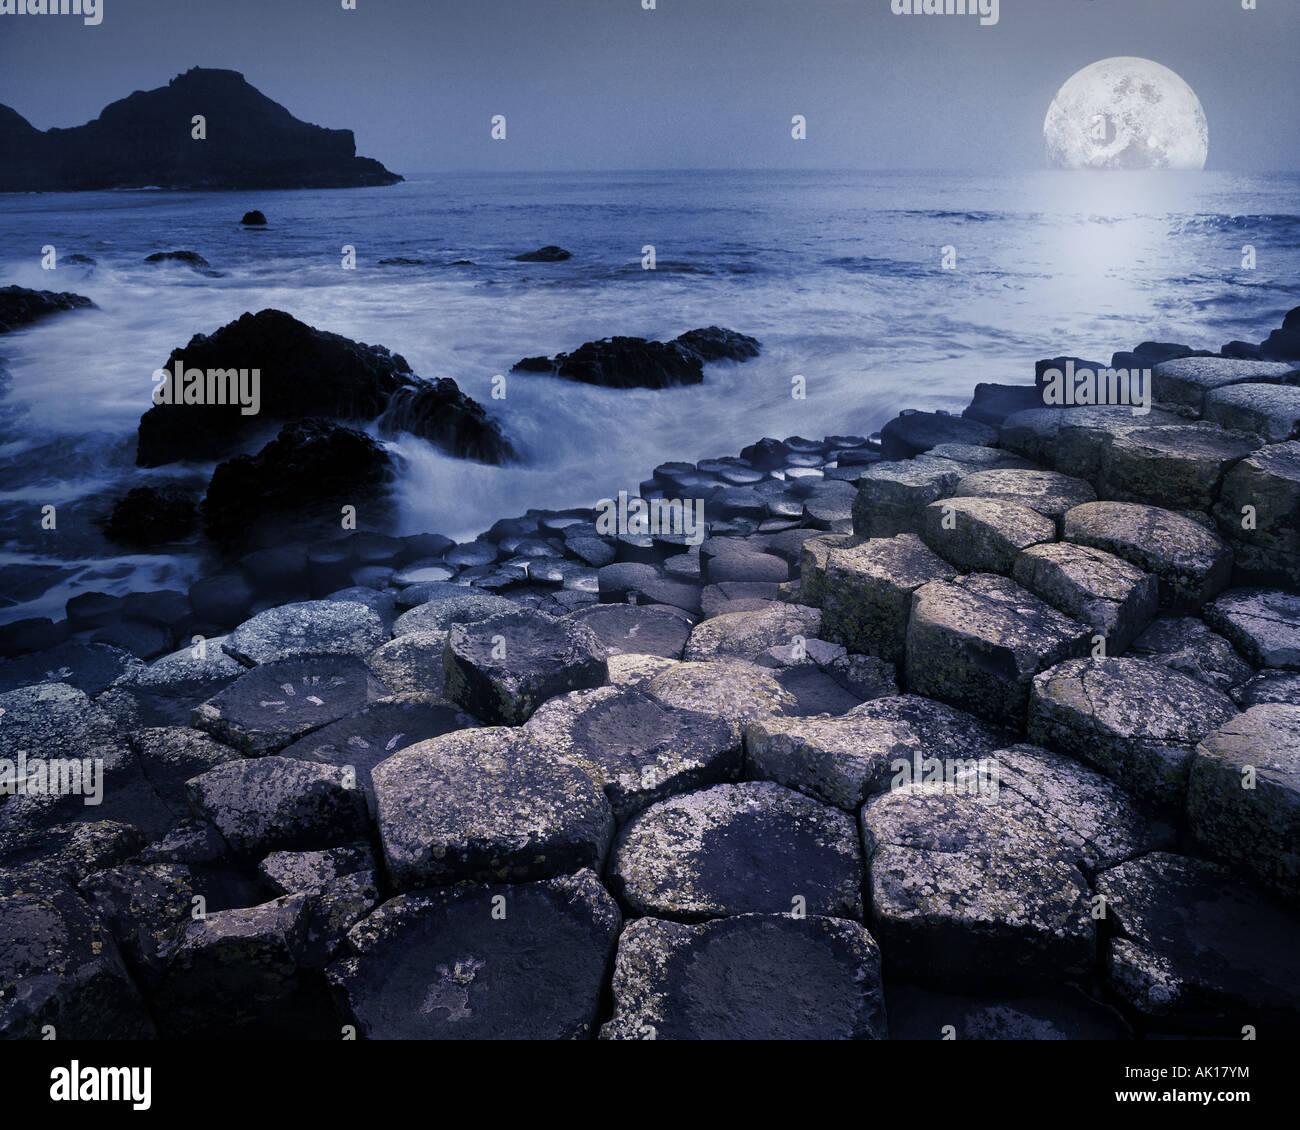 GB - IRLANDA DEL NORD: Luna Giant's Causeway Immagini Stock